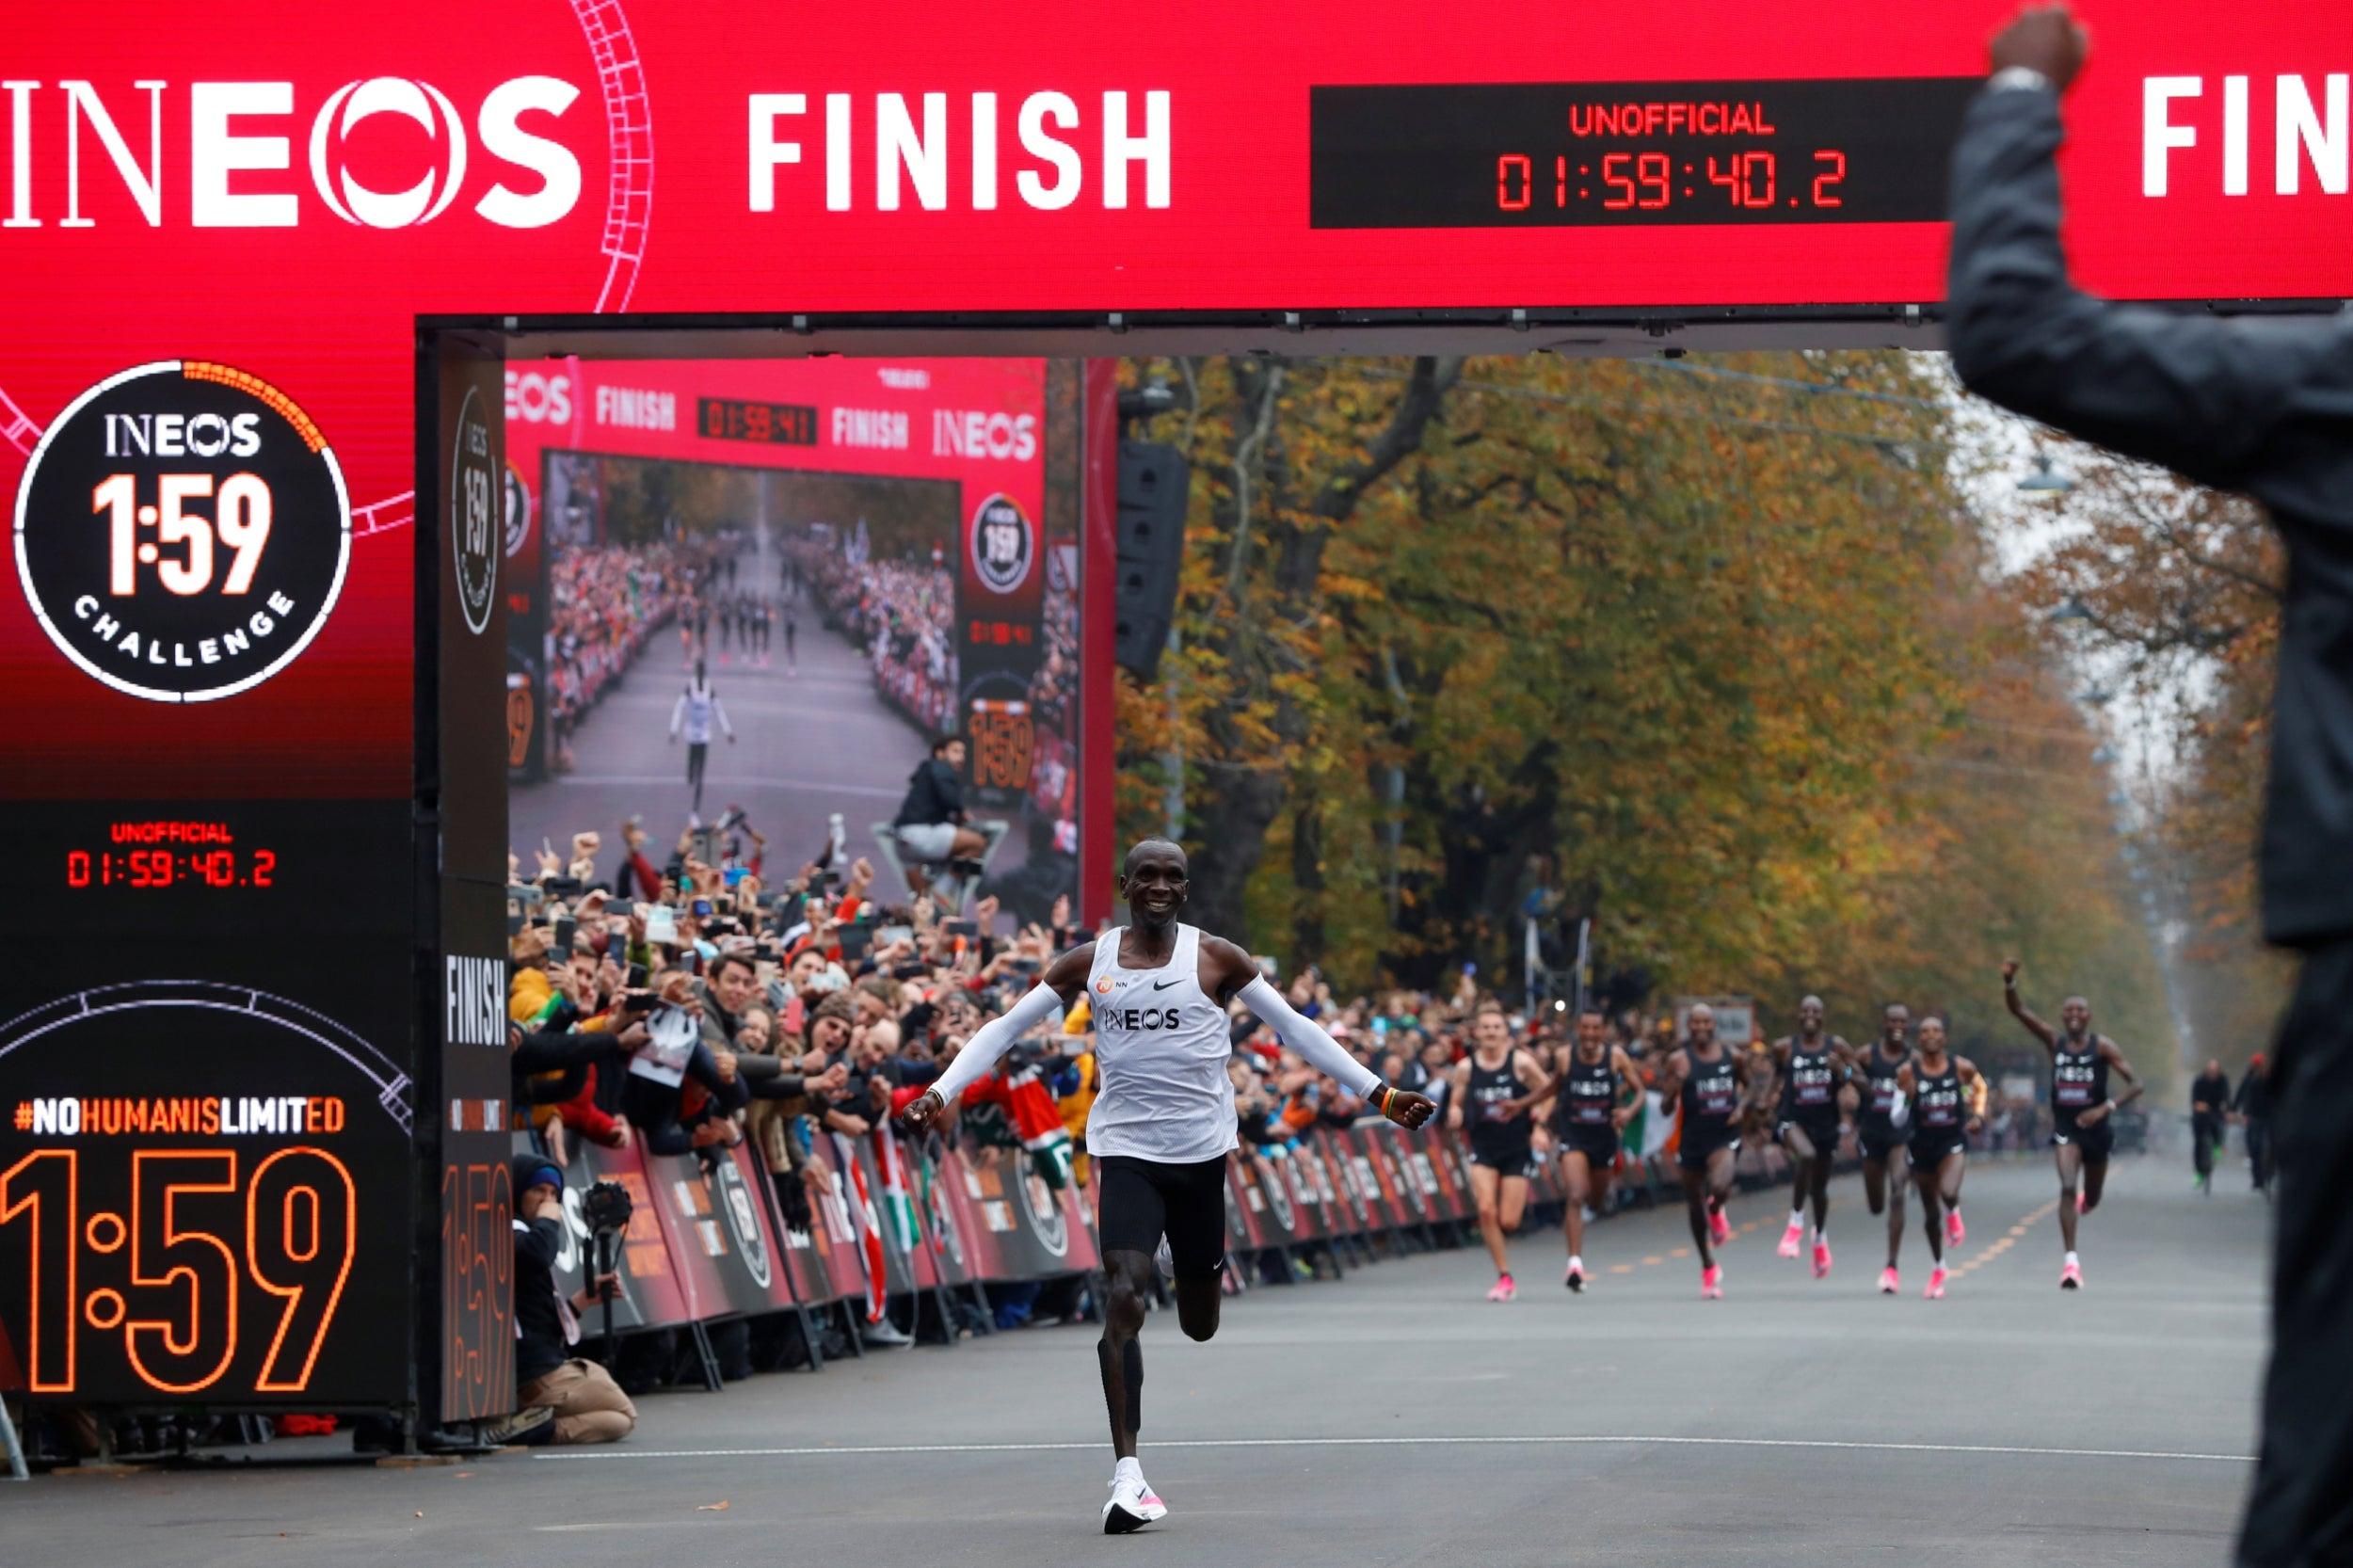 <b>Eliud Kipchoge breaks two-hour marathon barrier</b>